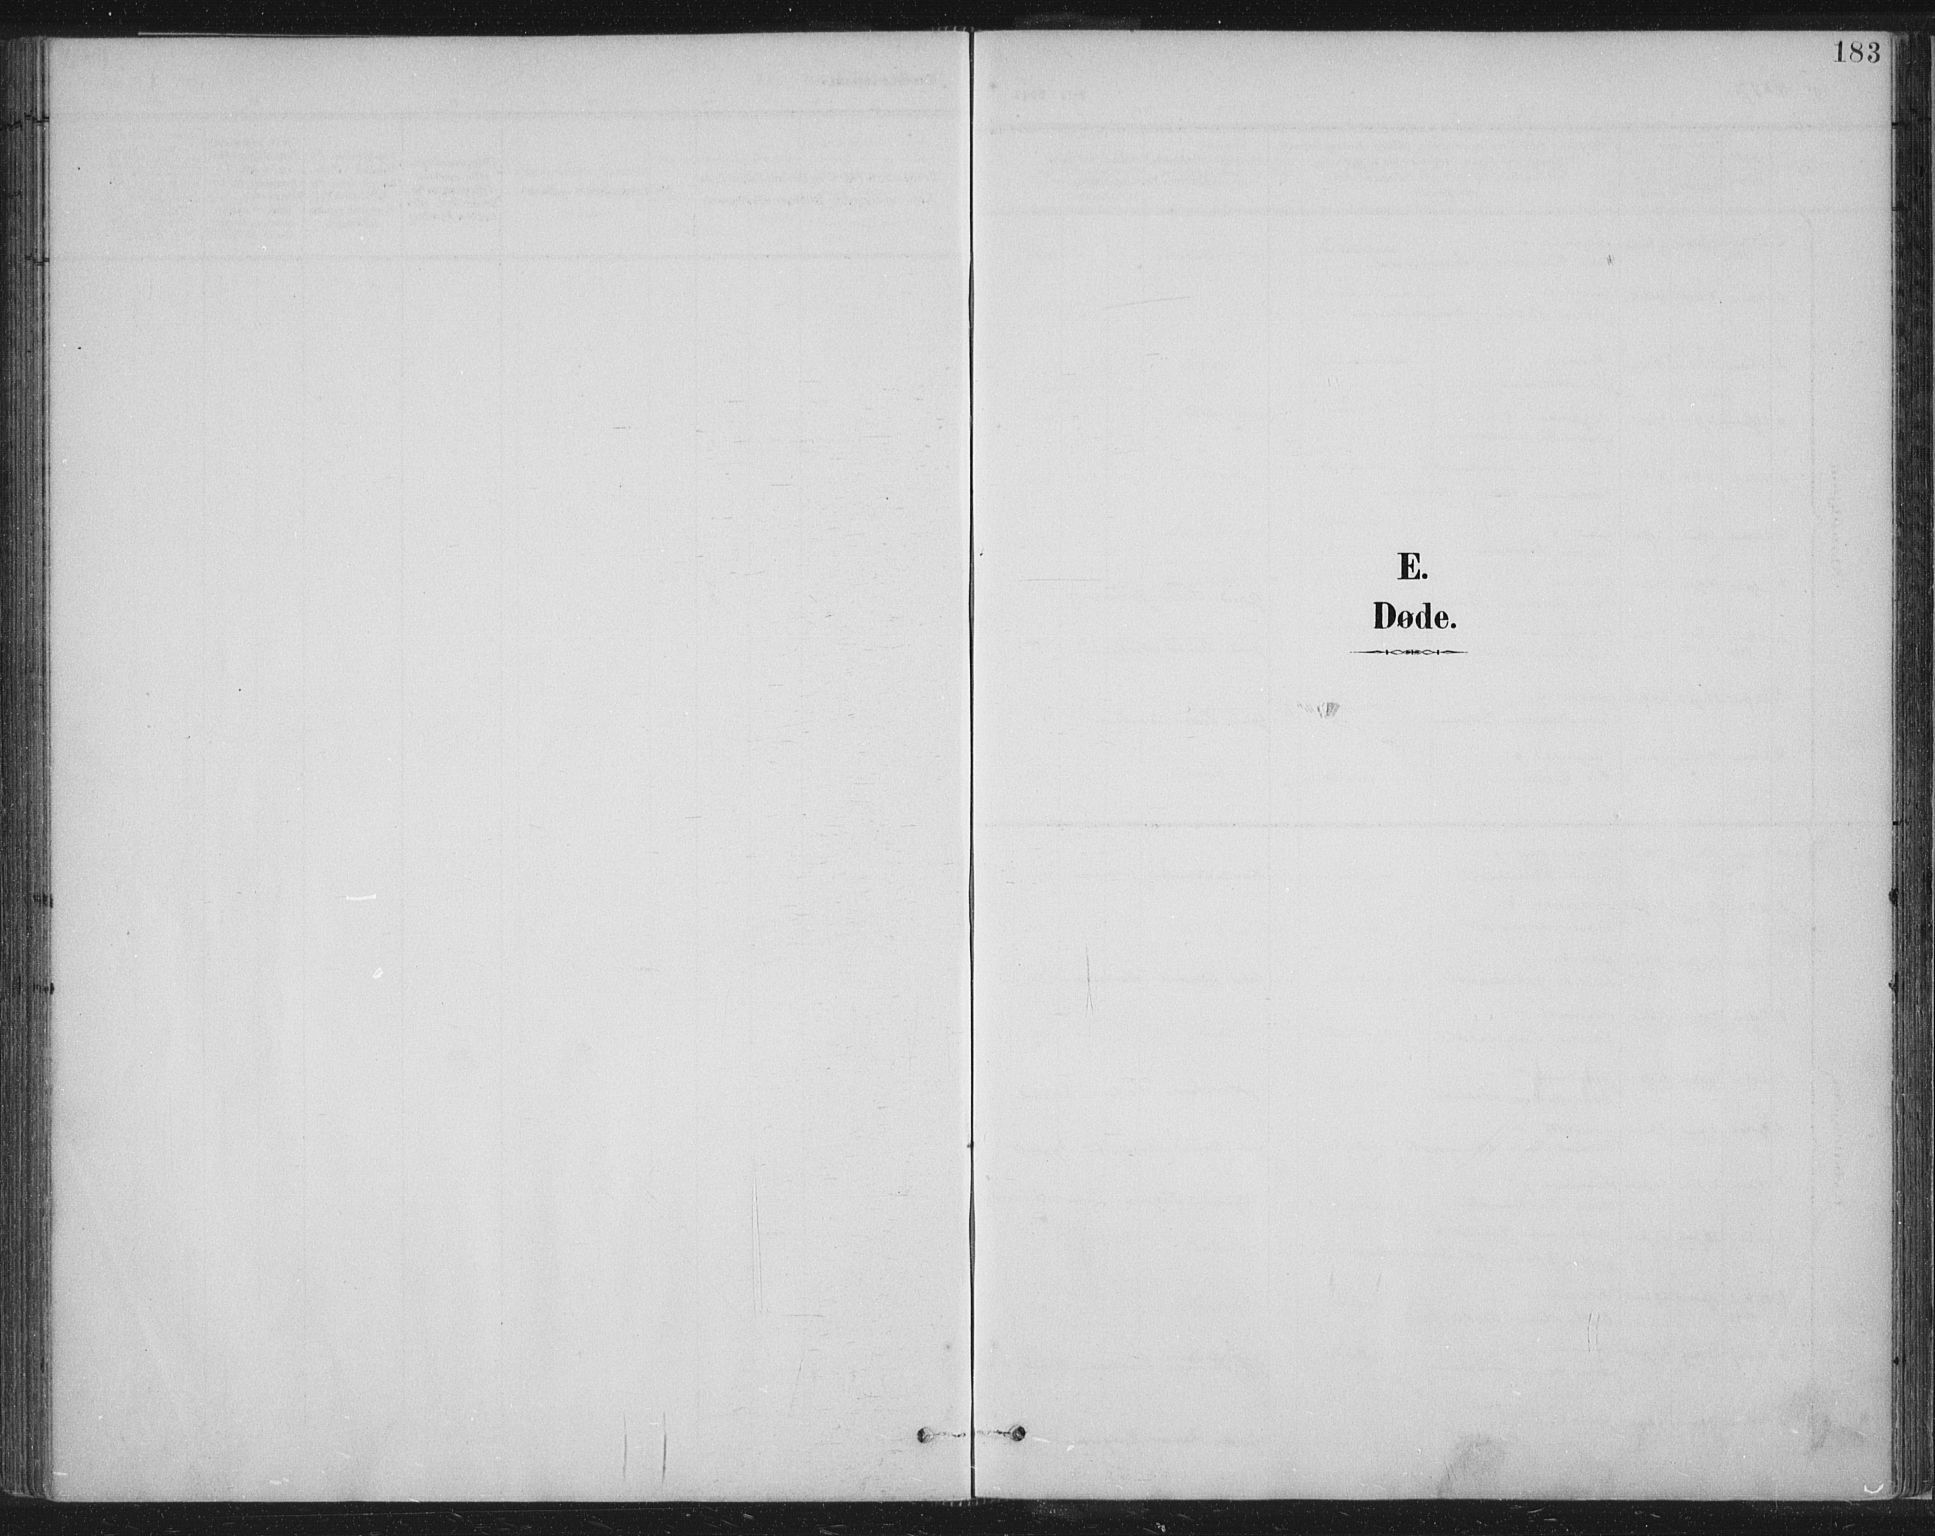 SAST, Tysvær sokneprestkontor, H/Ha/Haa/L0008: Ministerialbok nr. A 8, 1897-1918, s. 183